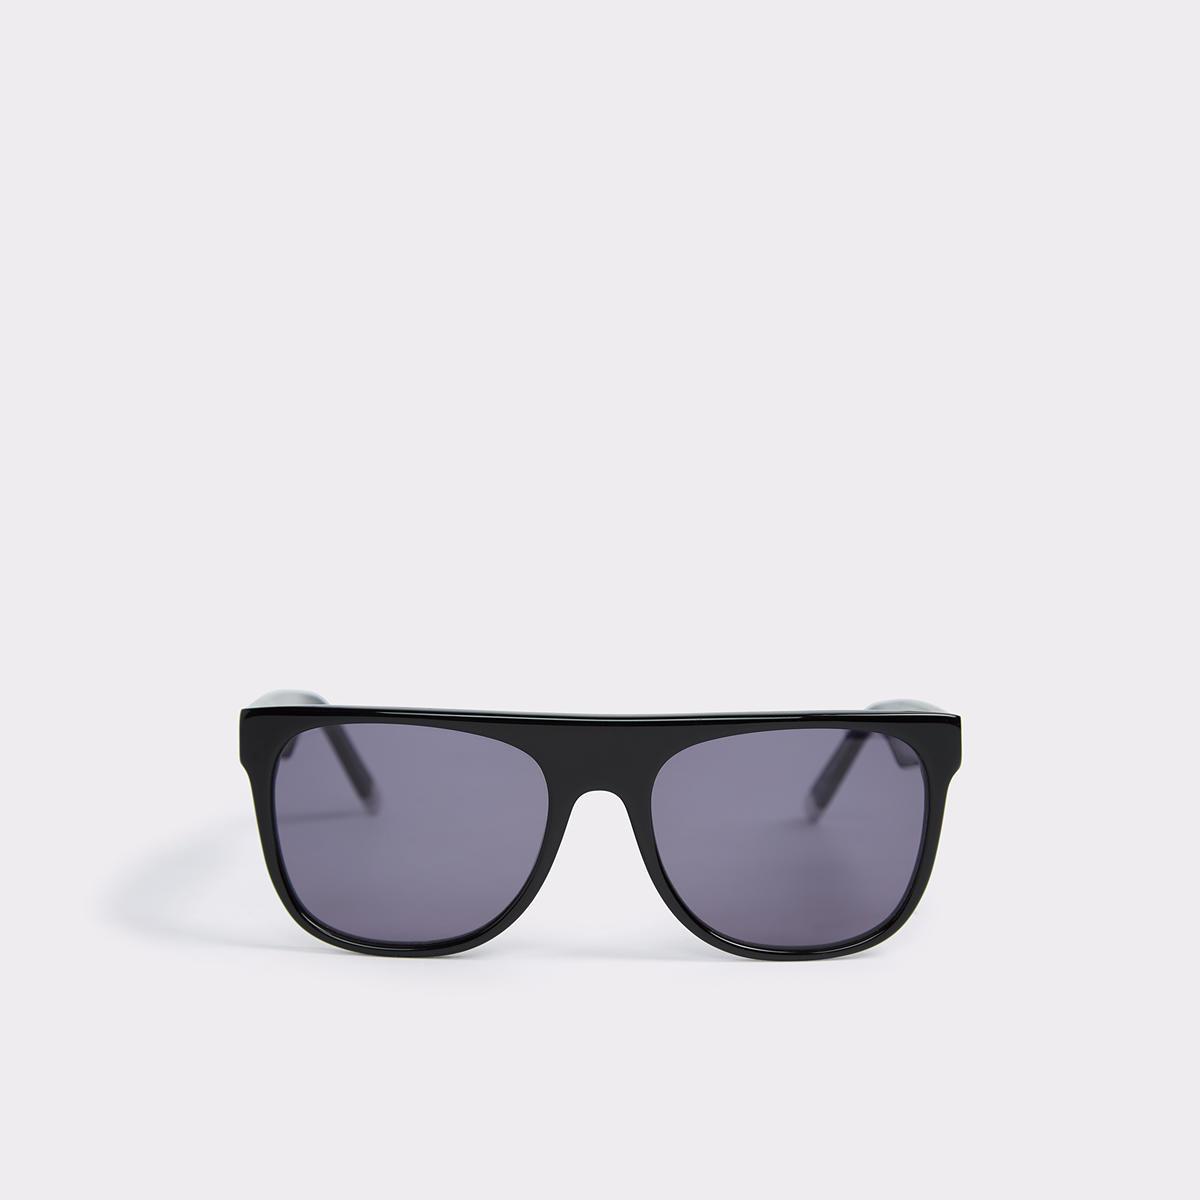 735b9f0b64 Elirevia Midnight Black Men s Signature sunglasses